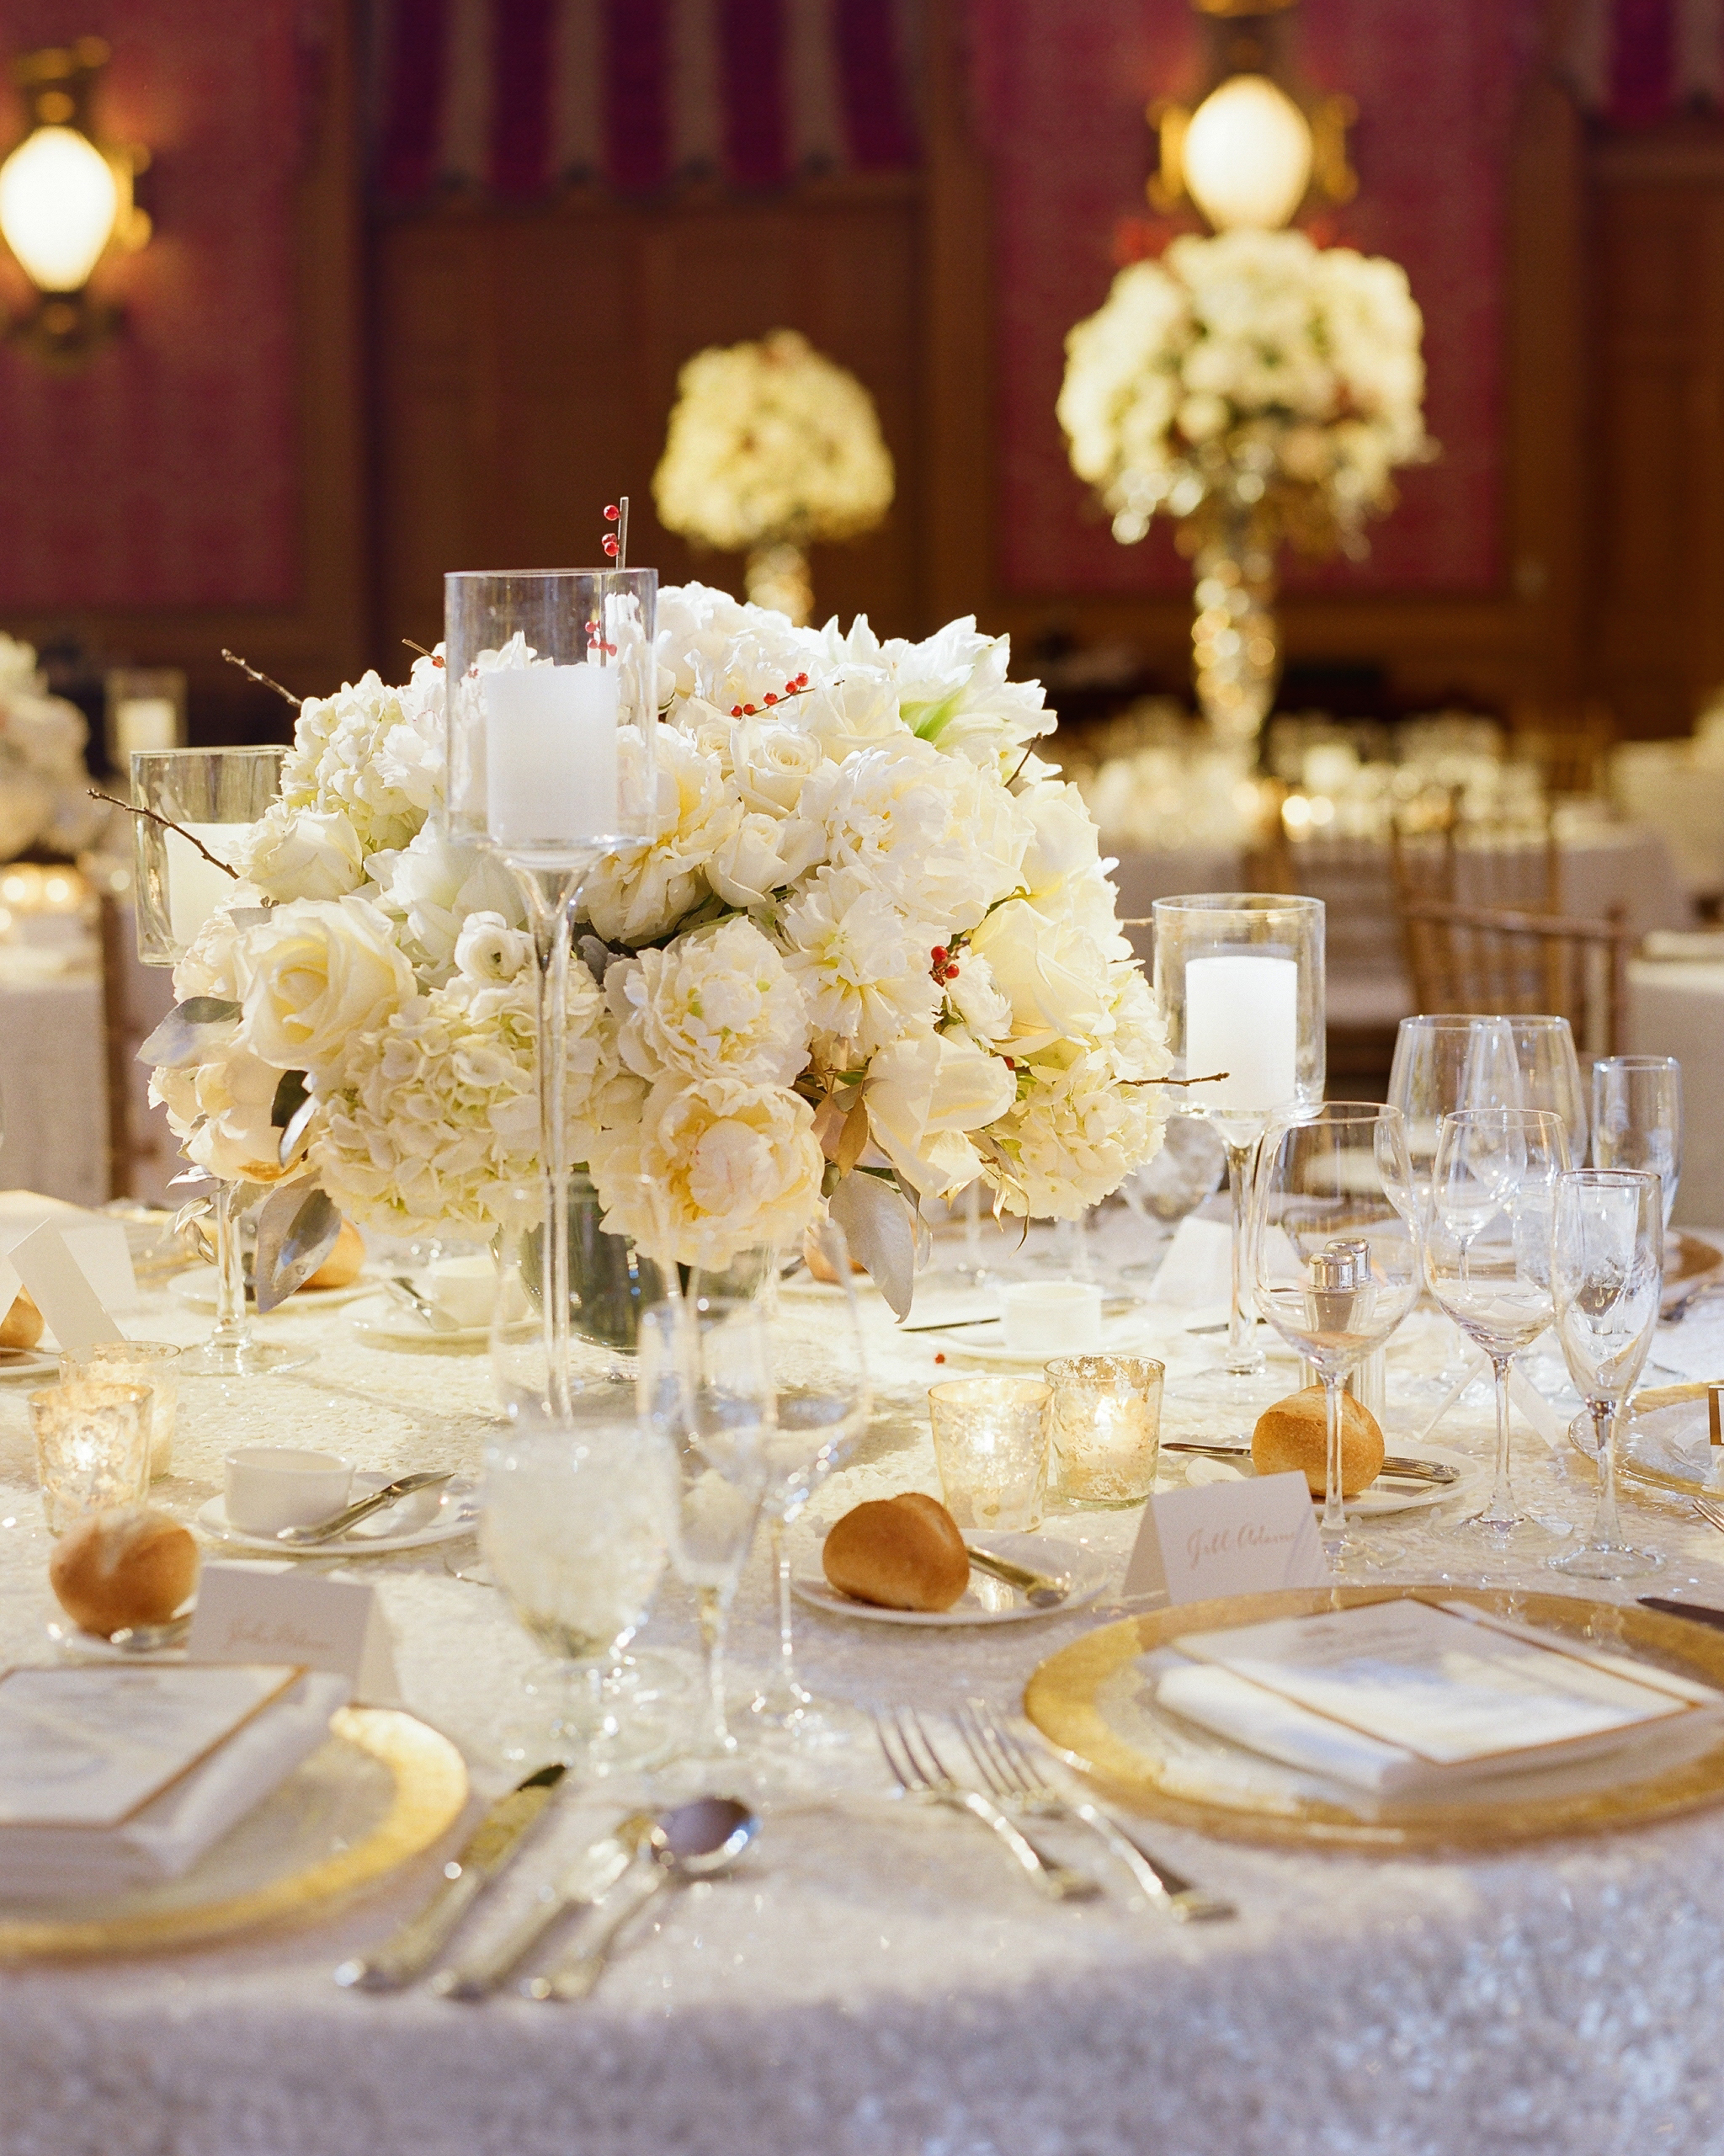 paige-michael-wedding-centerpiece-0964-s112431-1215.jpg